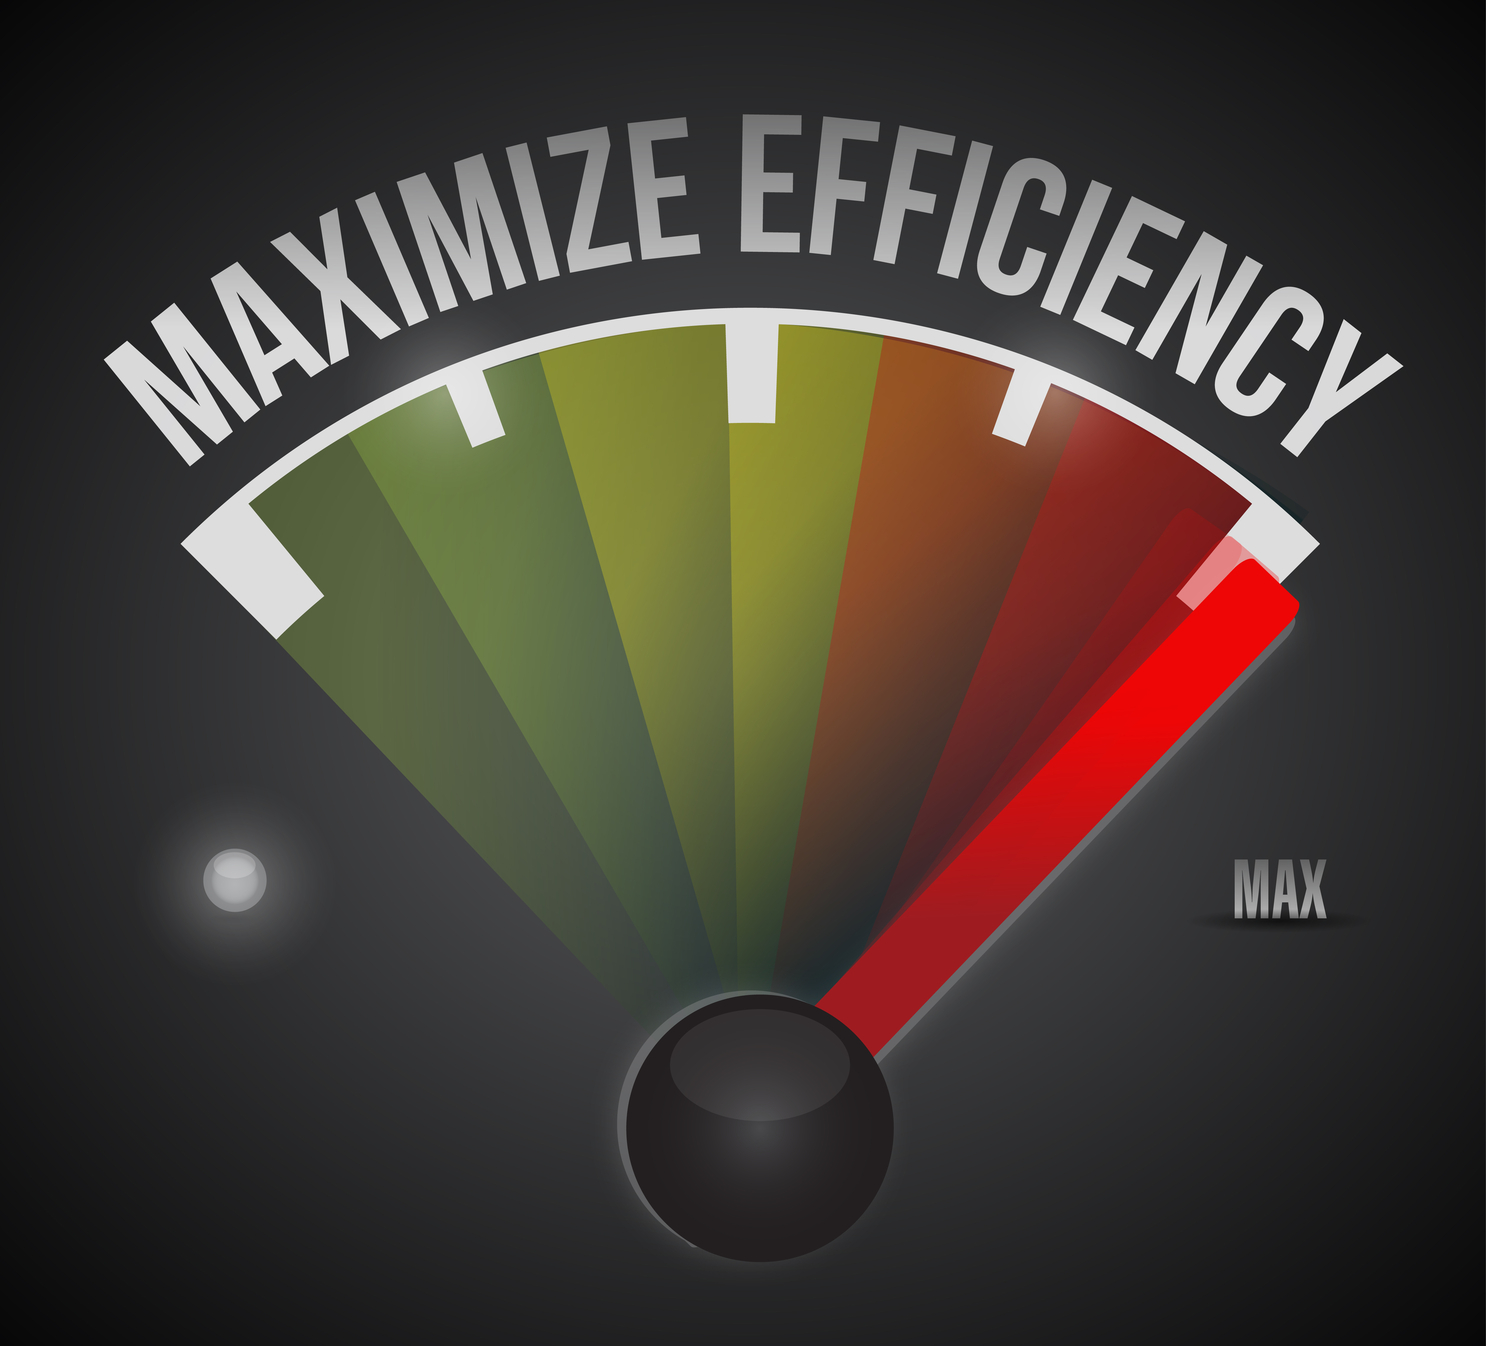 Post EHR Implementation Efficiency